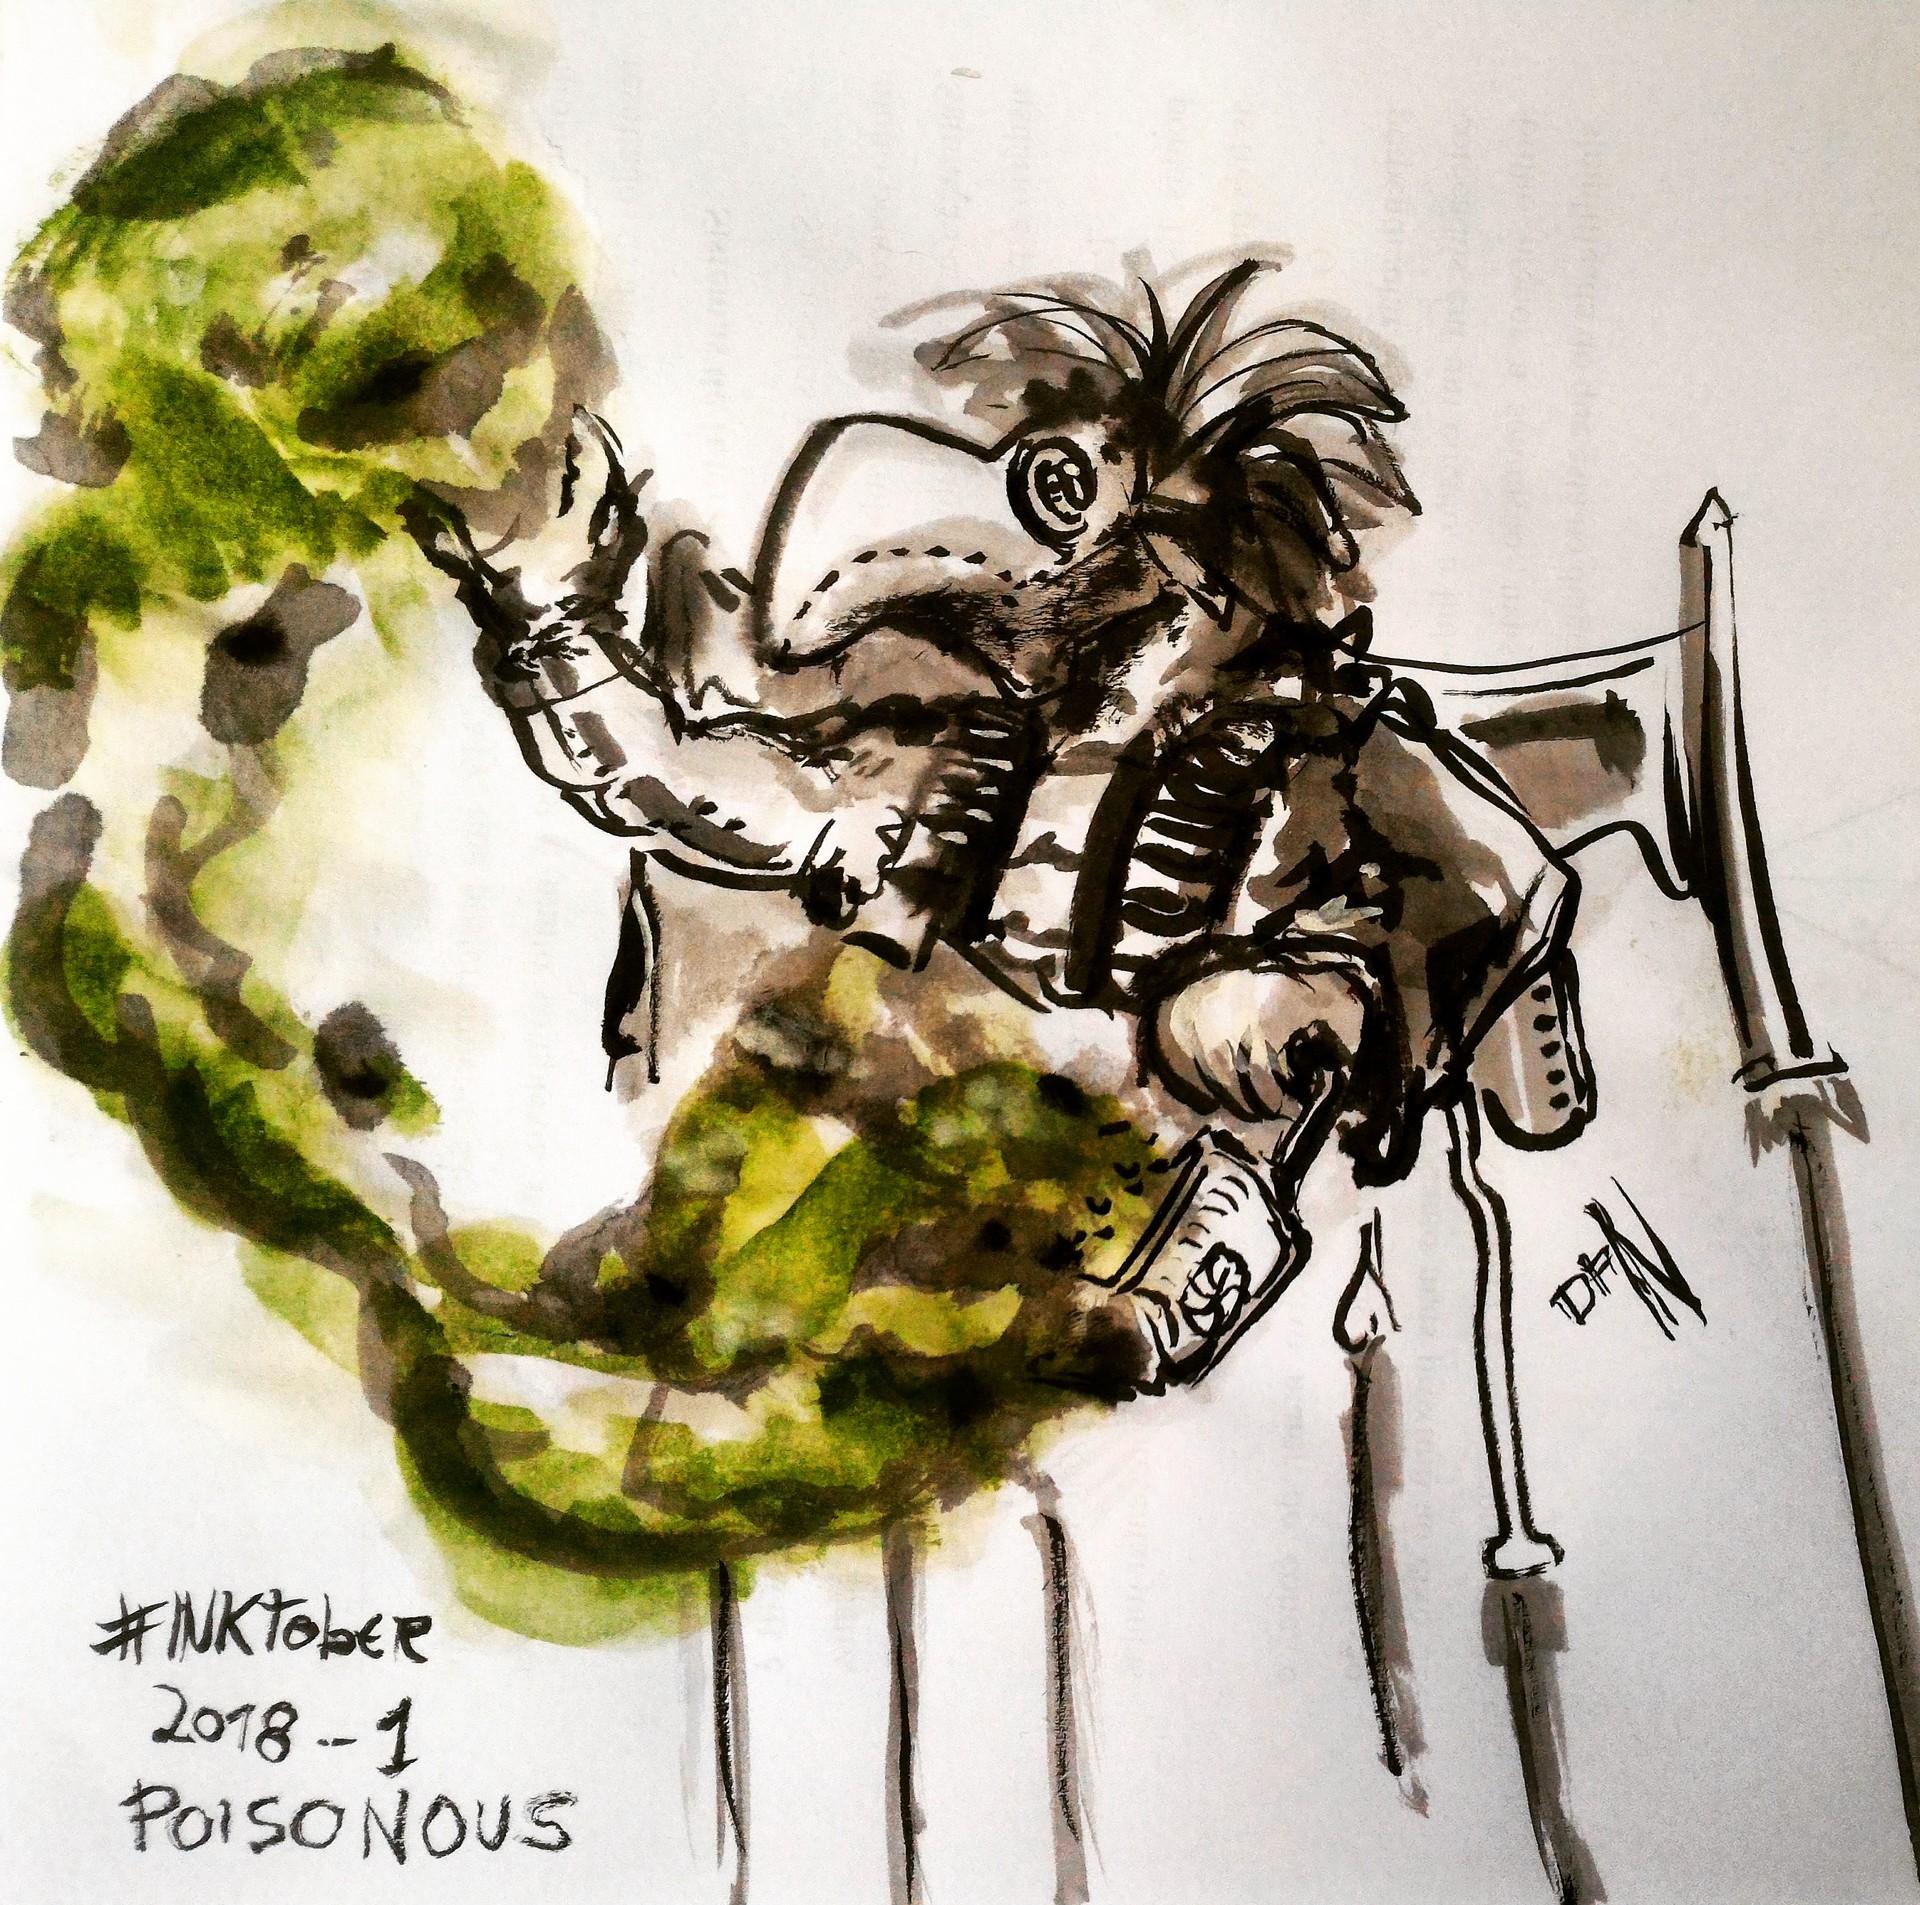 Inktober 2018 - 01: Poisonous / Venenoso